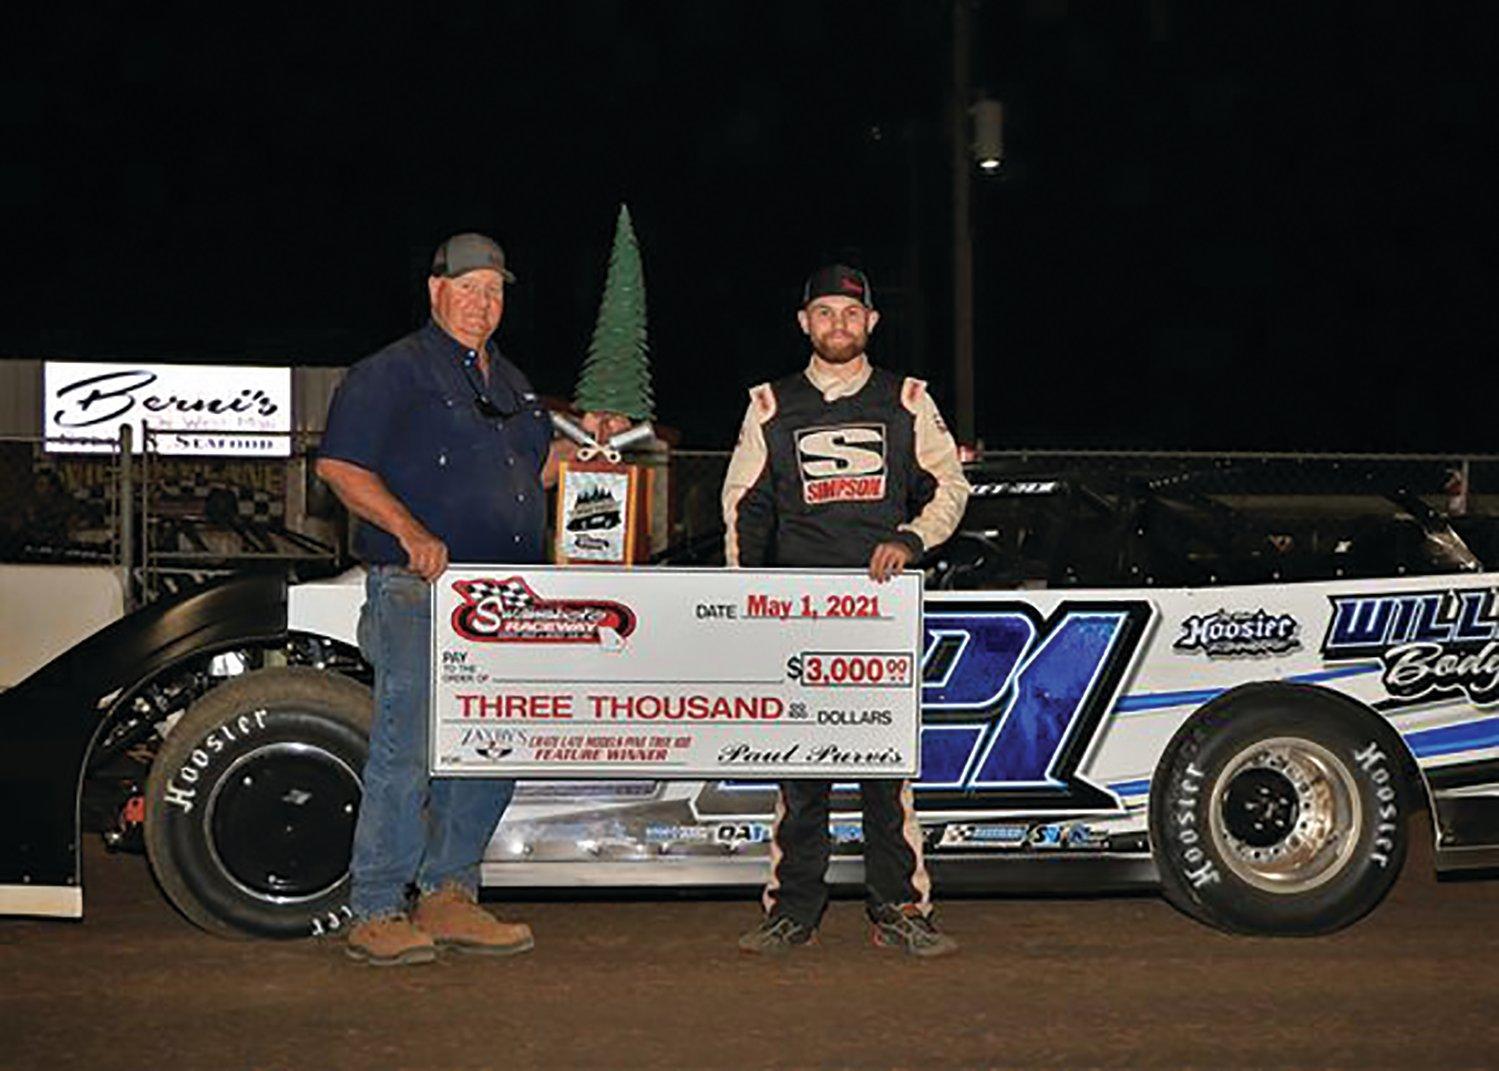 Pine Tree 100 Makes History at Swainsboro Raceway!